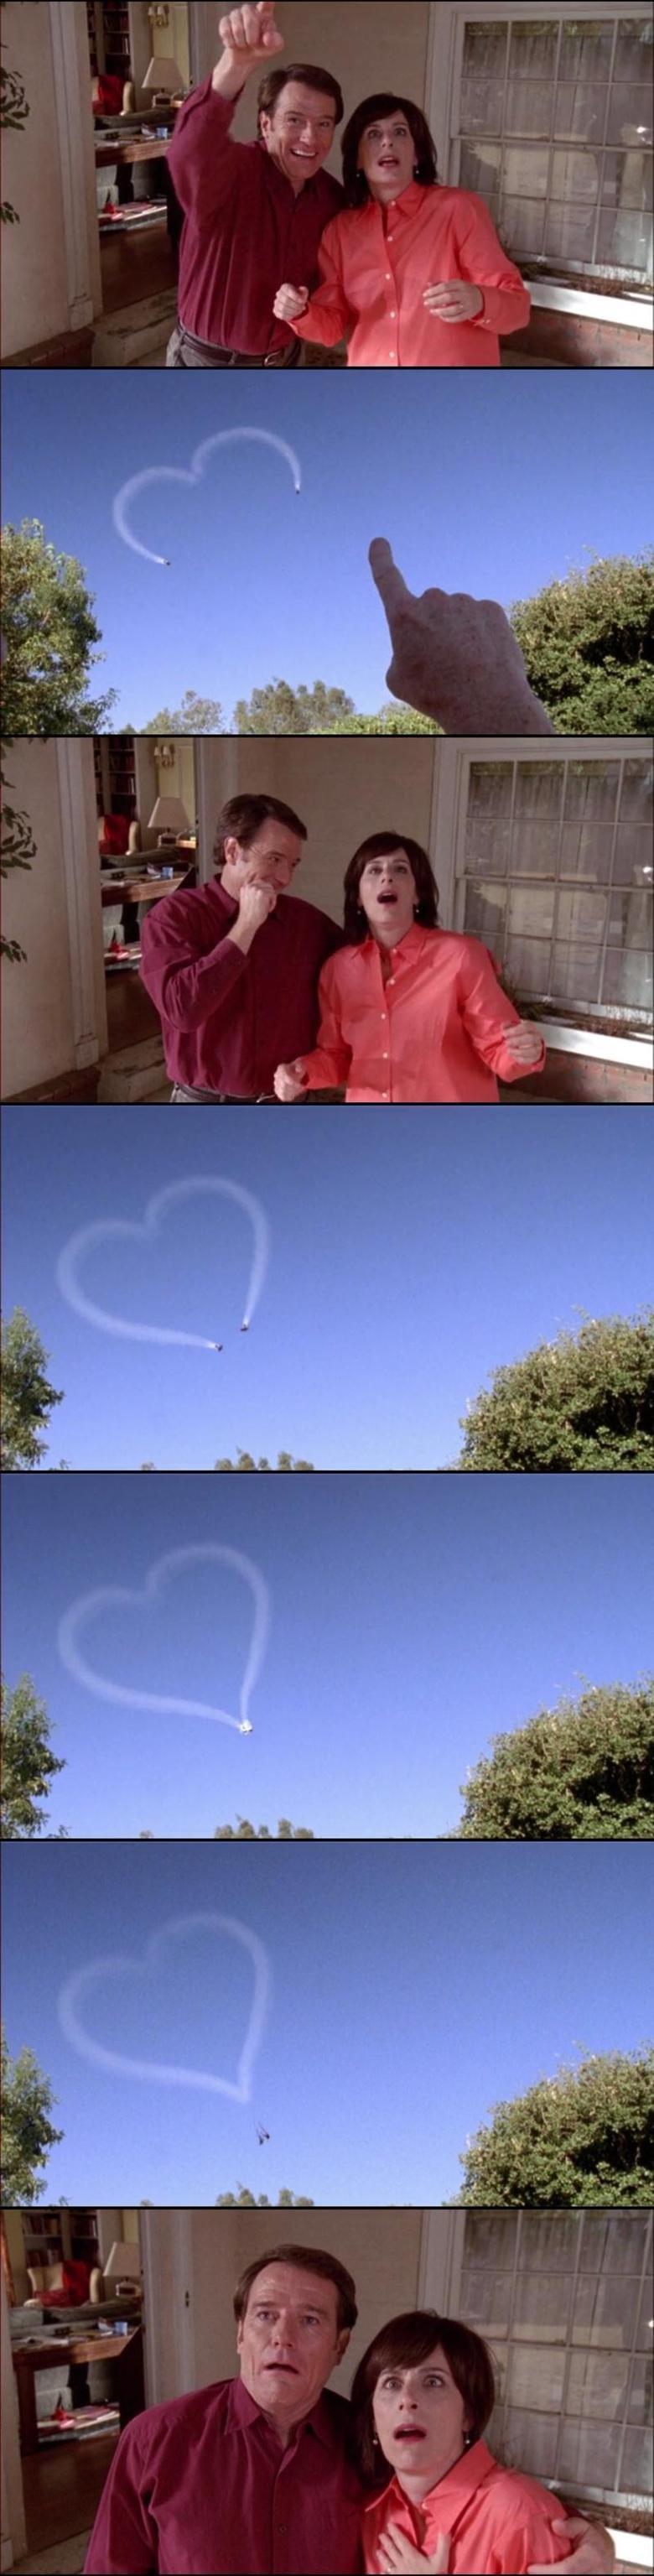 Coincidence?. Walt was no stranger to causing plane crashes.